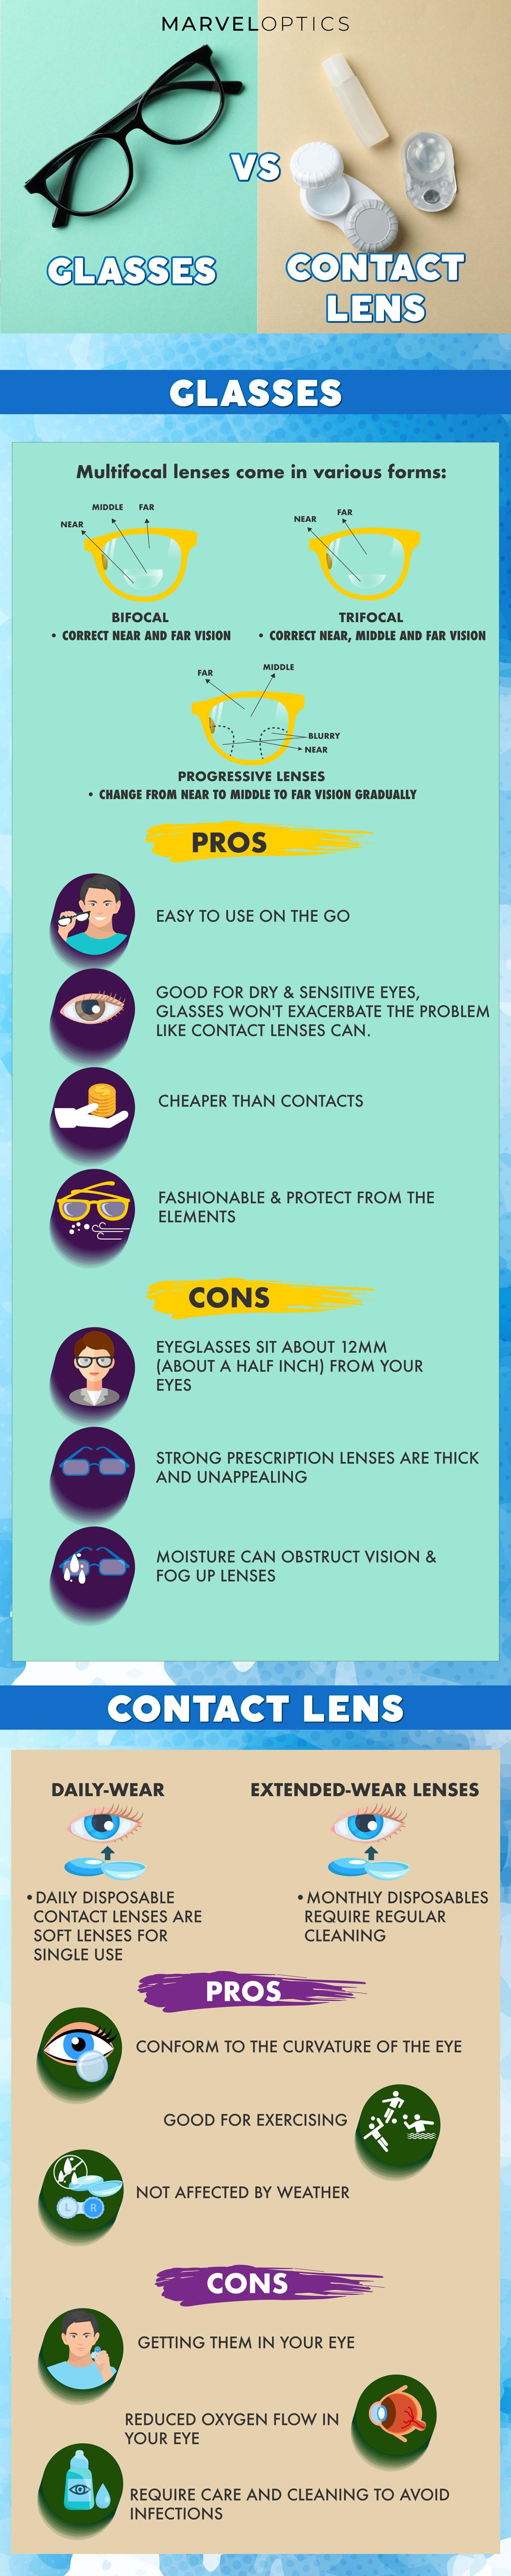 Comparing Contacts vs Glasses